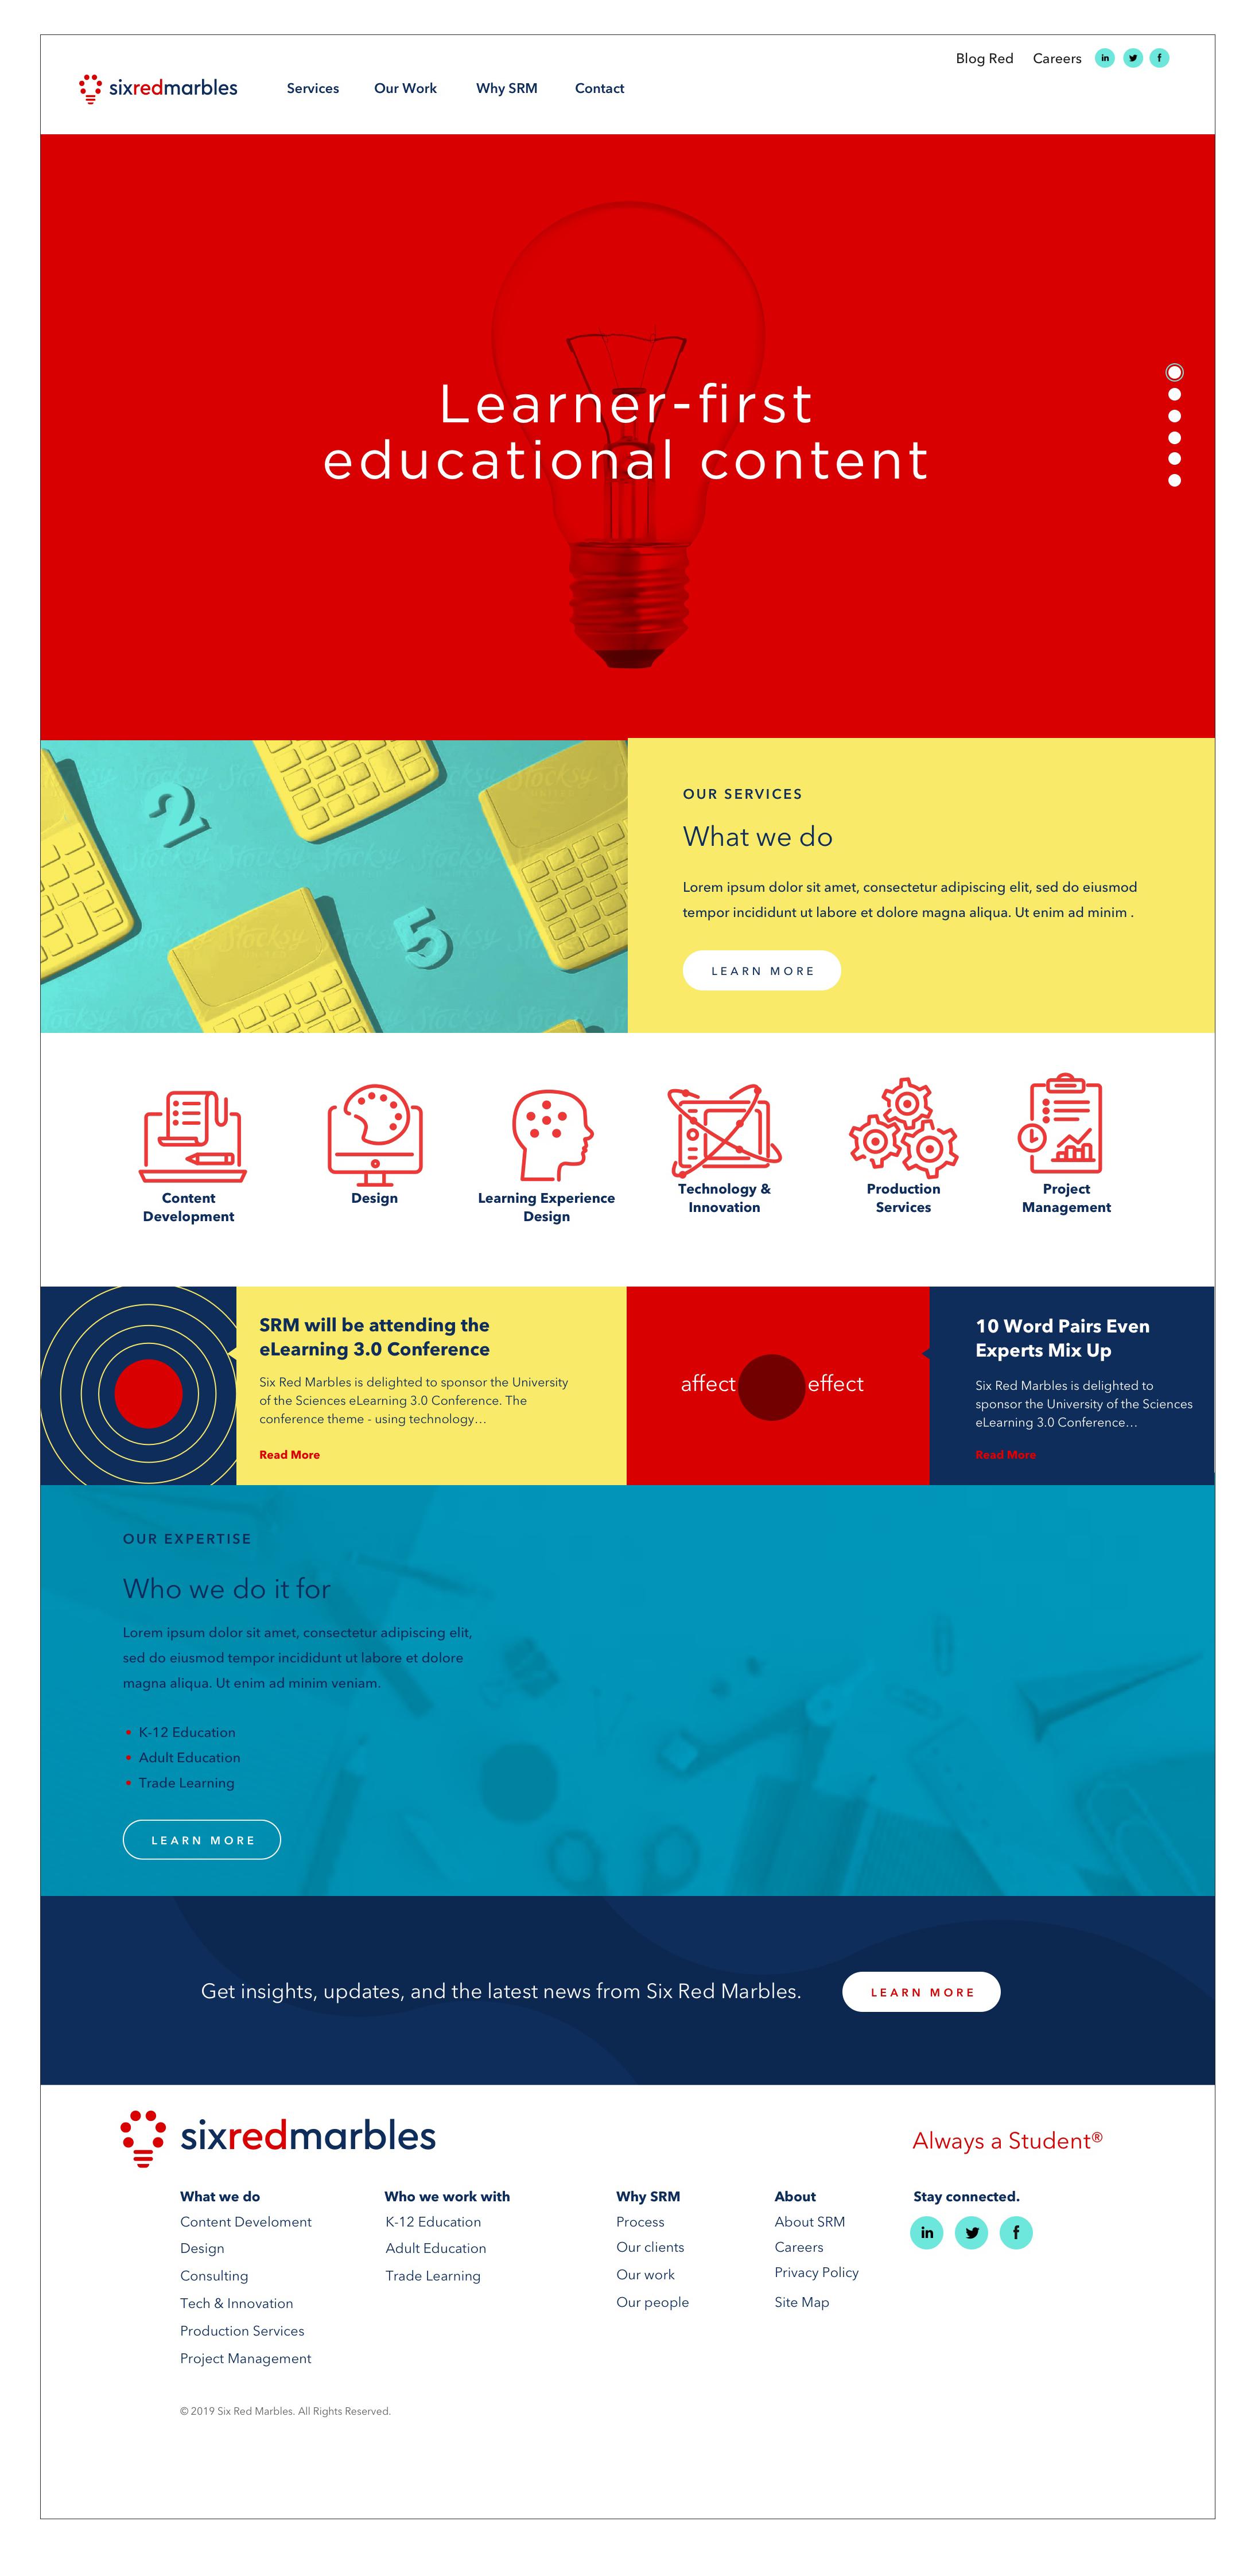 WEBSITE DESIGN - Proposed design for Six Red Marbles.